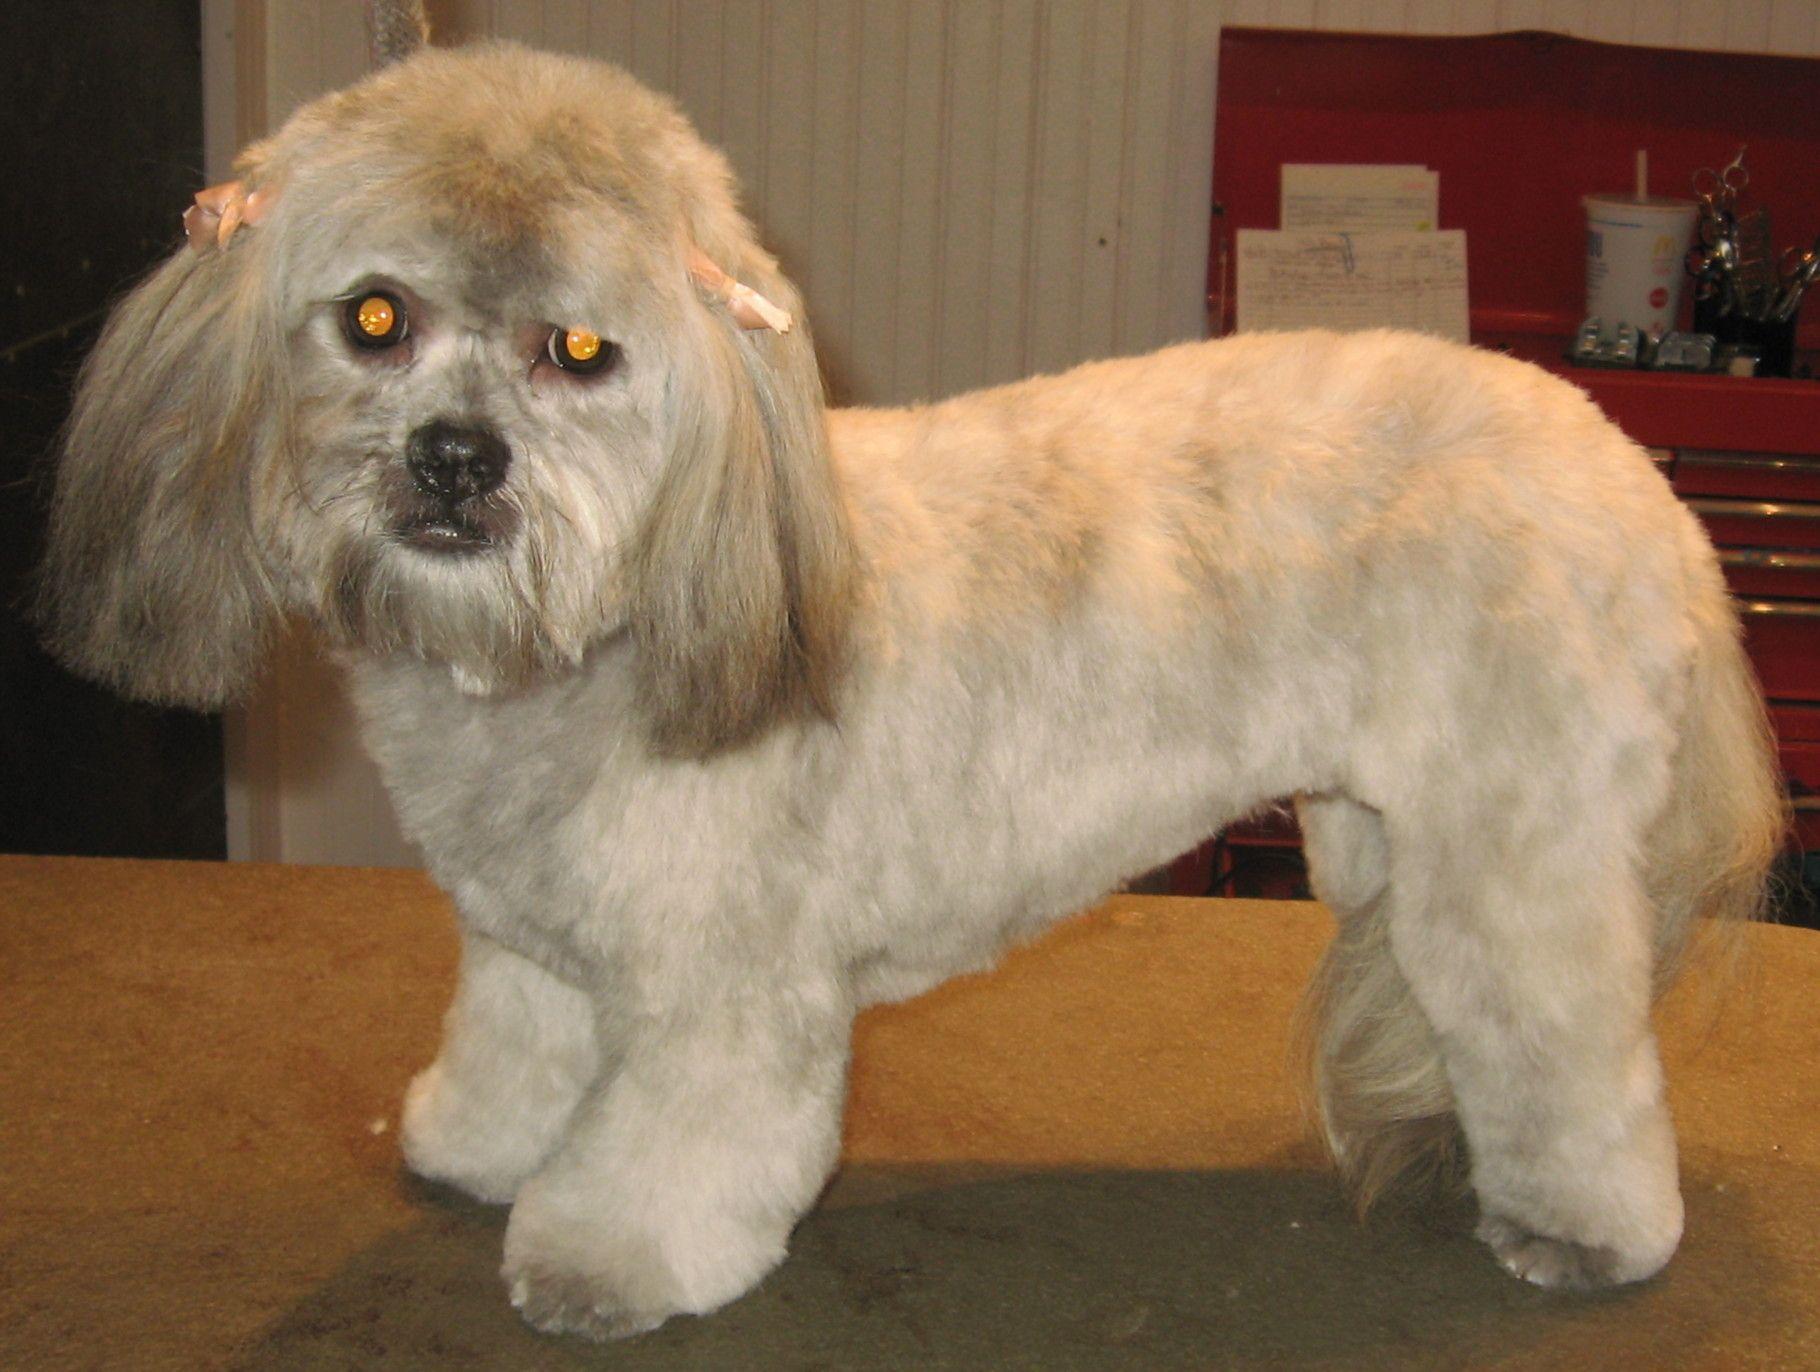 Pomeranian Shih Tzu Poodle Mix Shih Tzu Poodle Shitzu Mix Poodle Mix